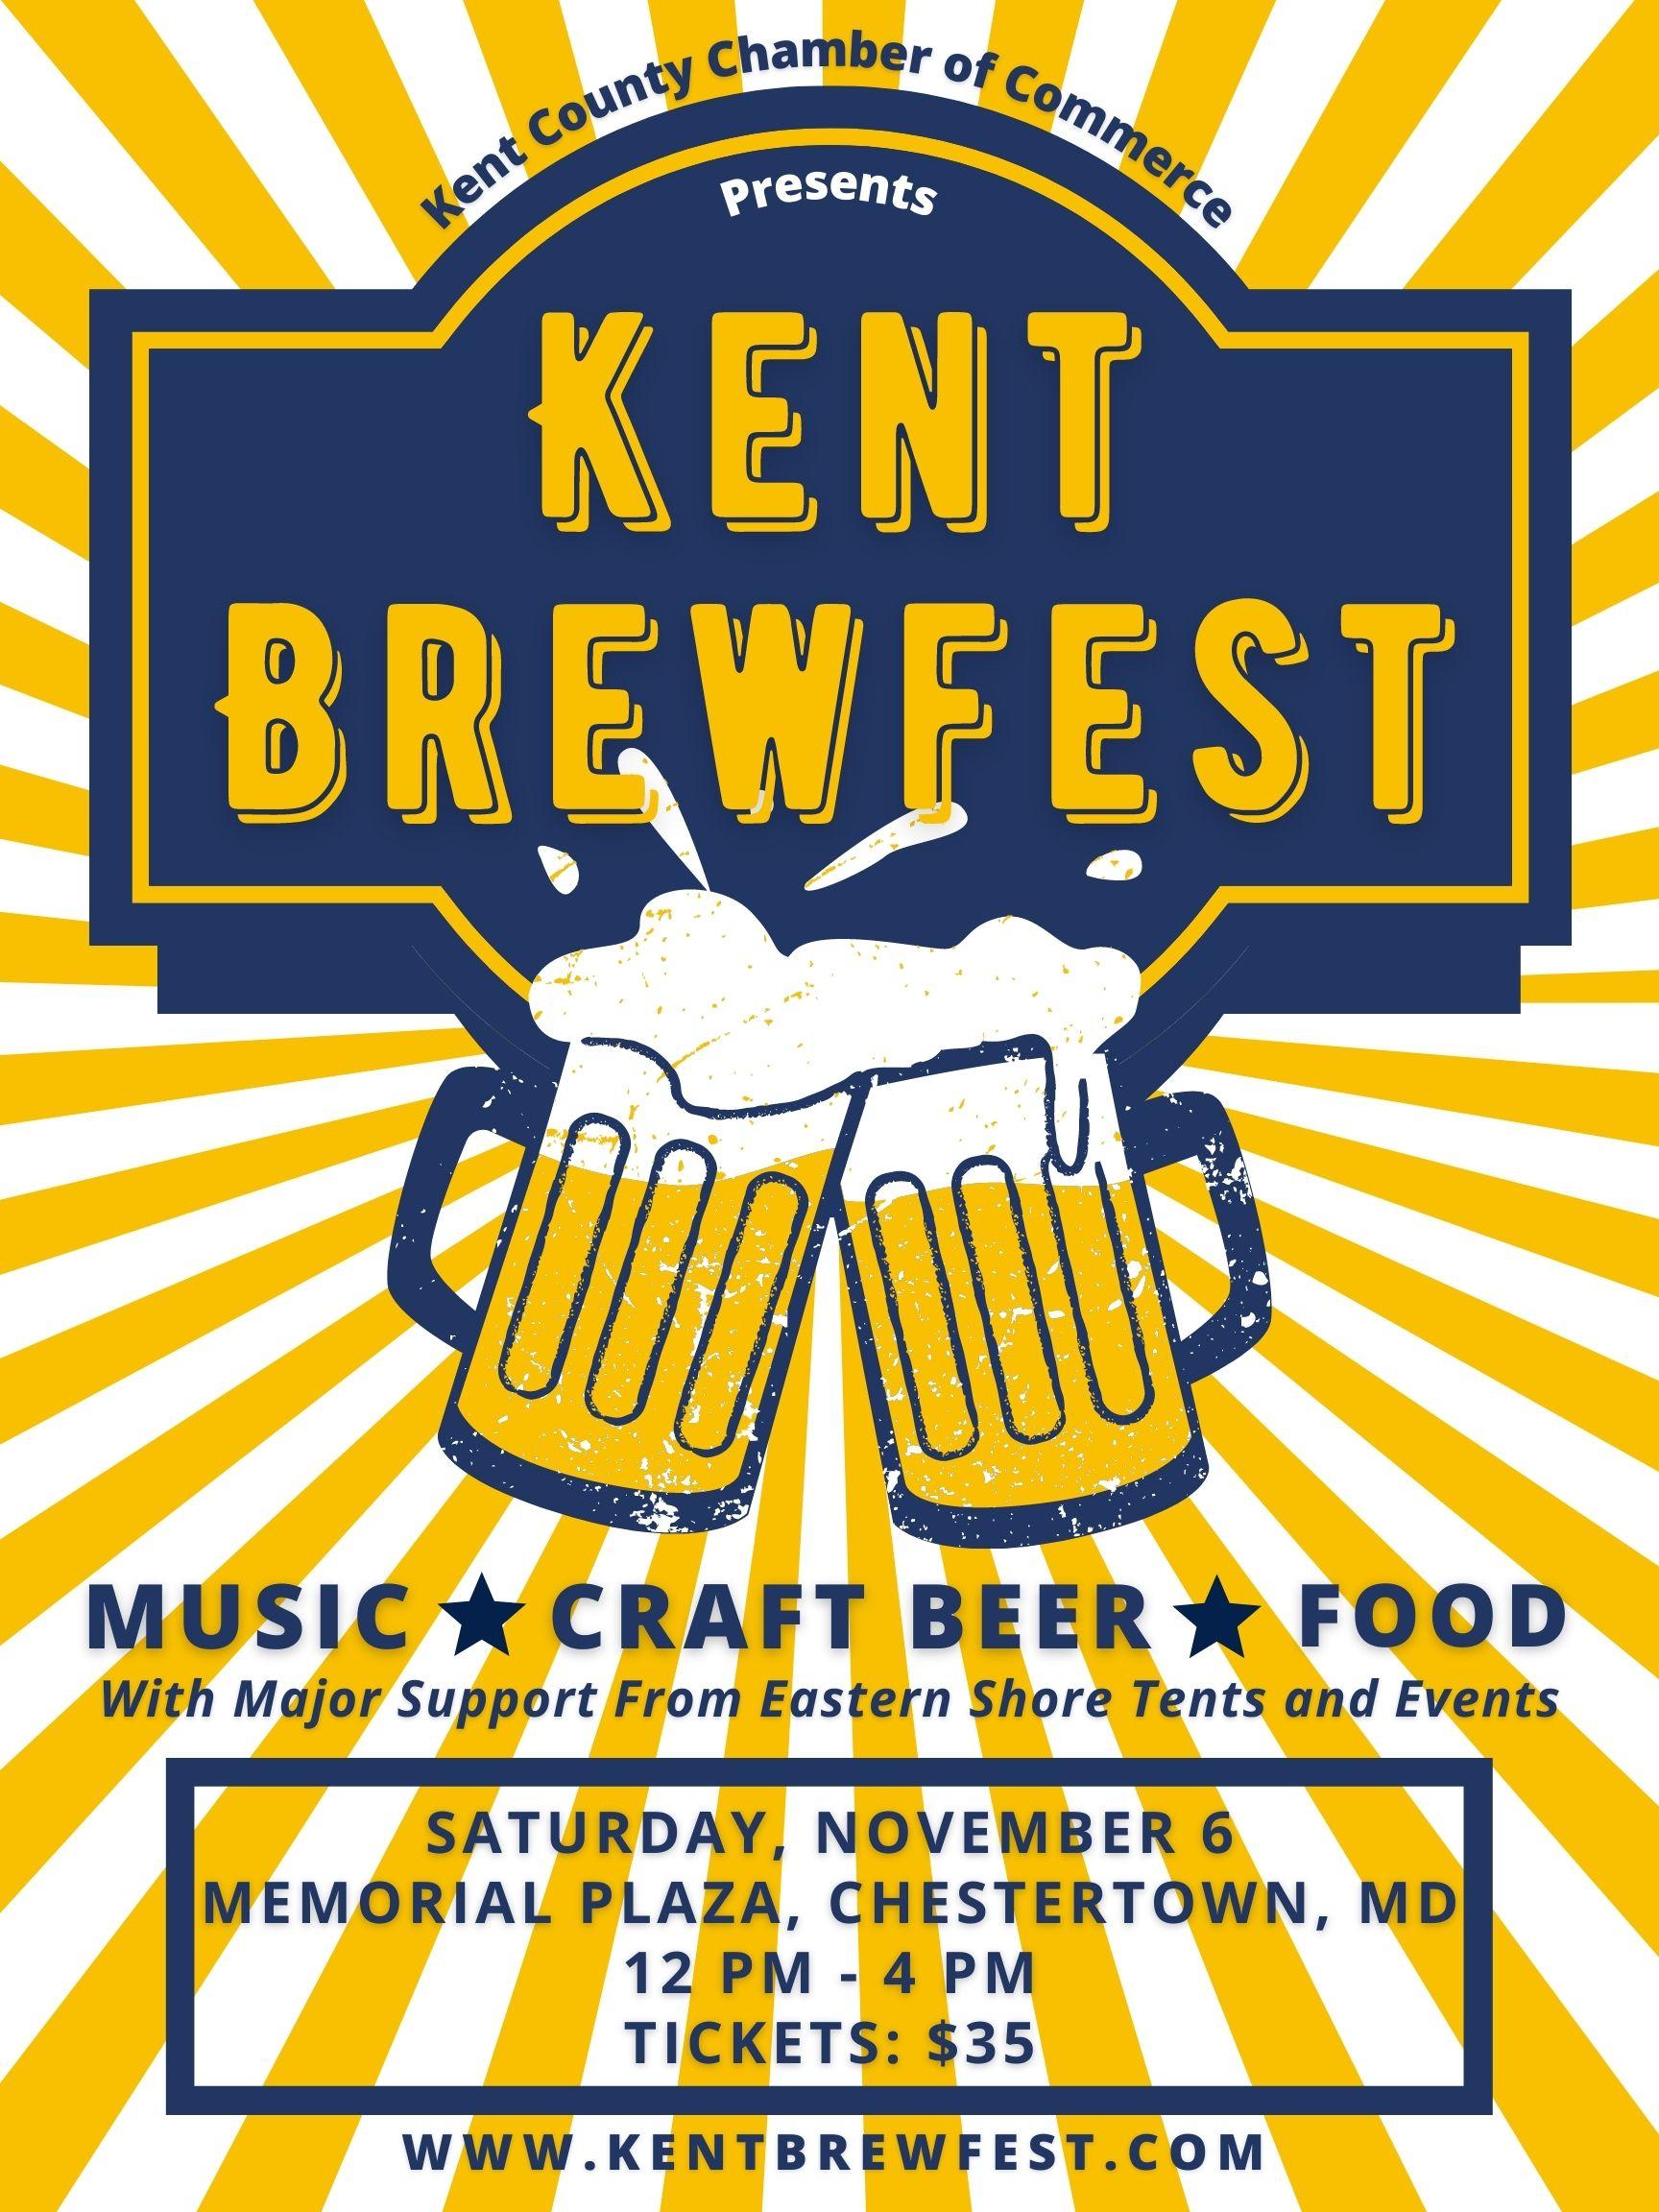 Kent BrewFest